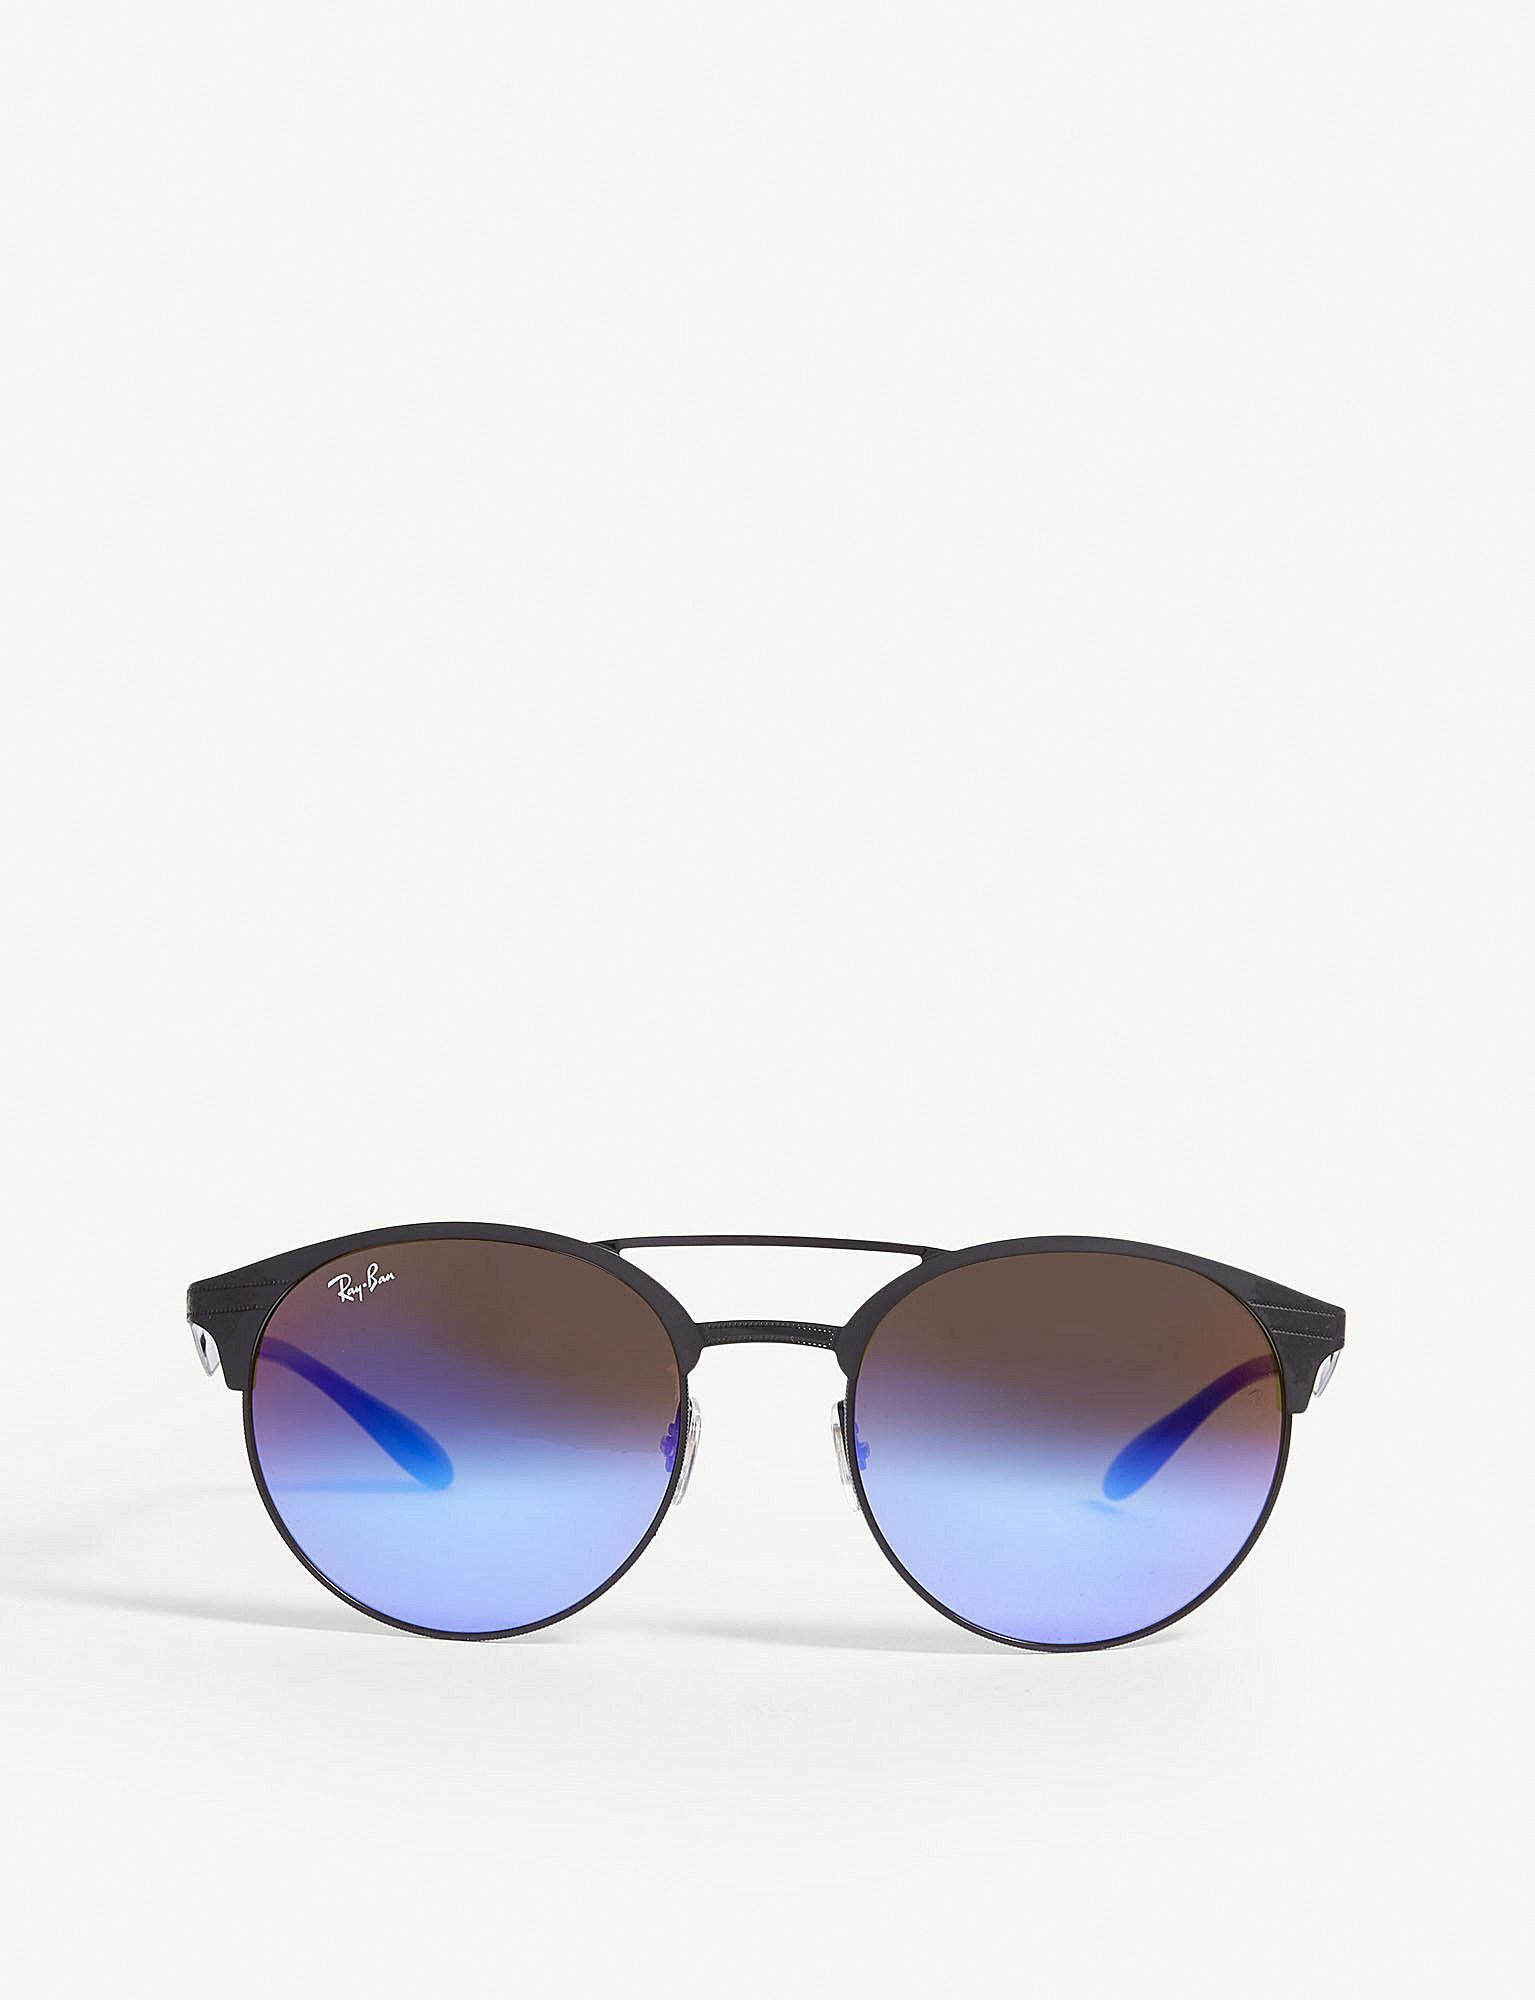 3781a882d6 Ray-Ban Rb3545 Phantos-frame Sunglasses in Black - Lyst